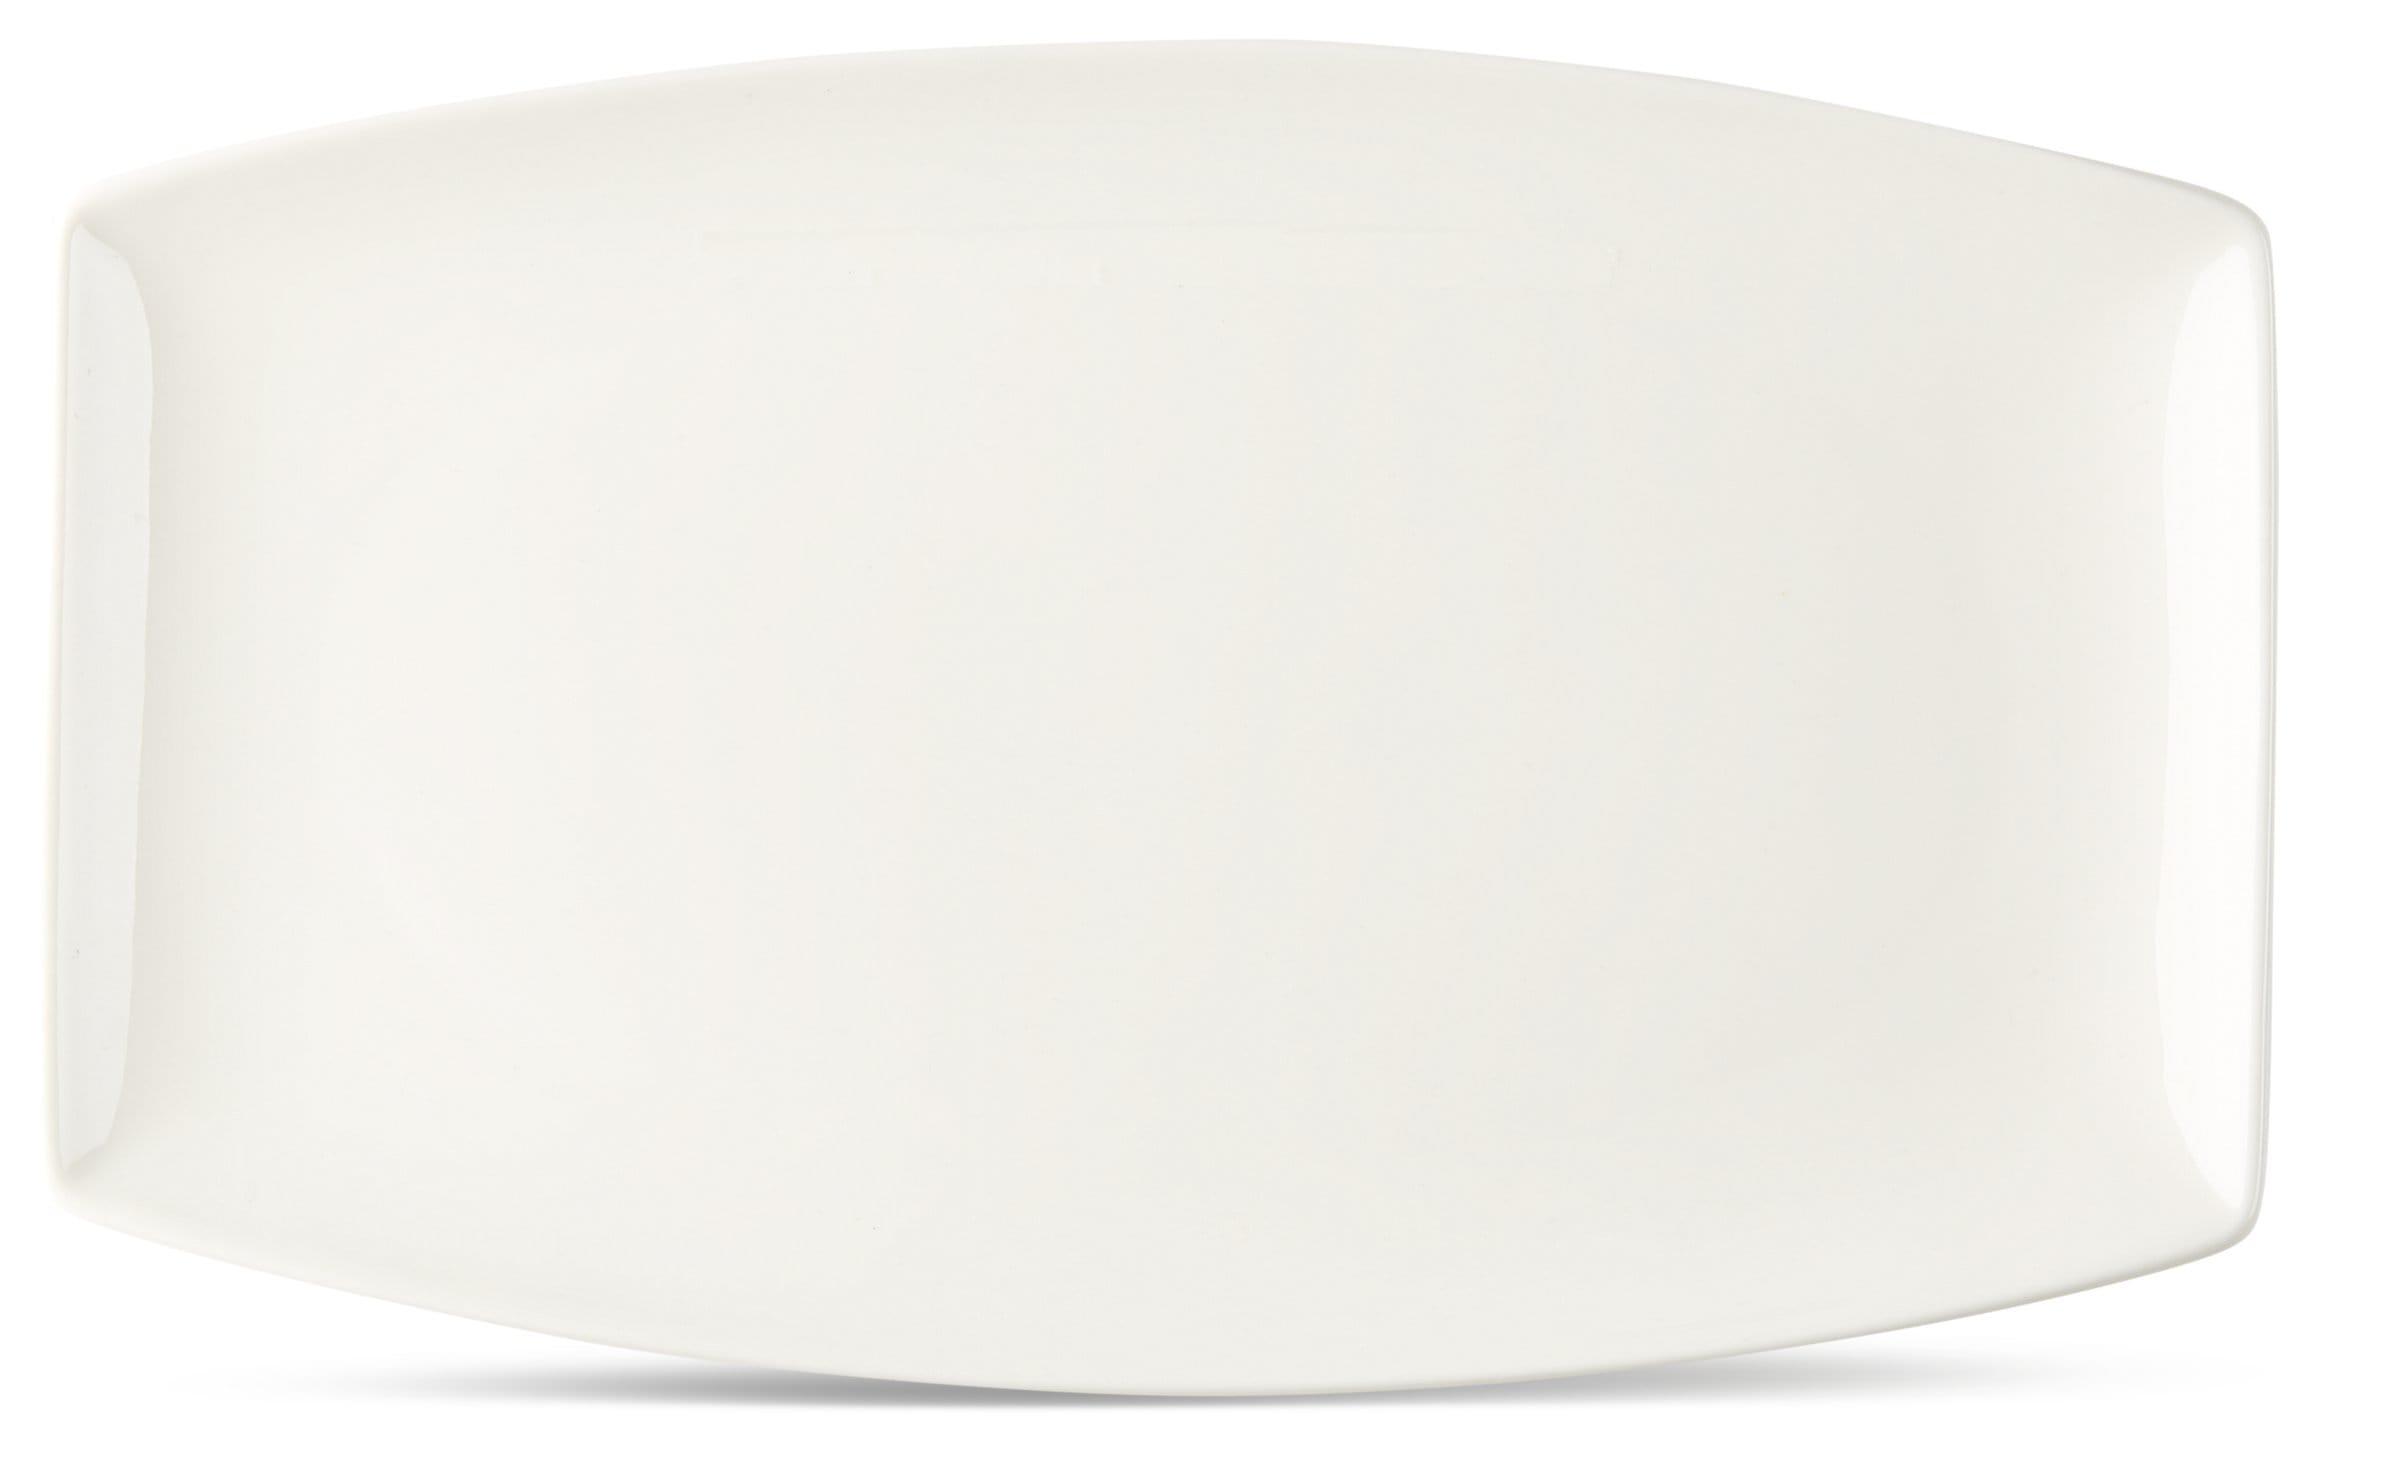 Cucina & Tavola FINE LINE Plat 22.5x14cm